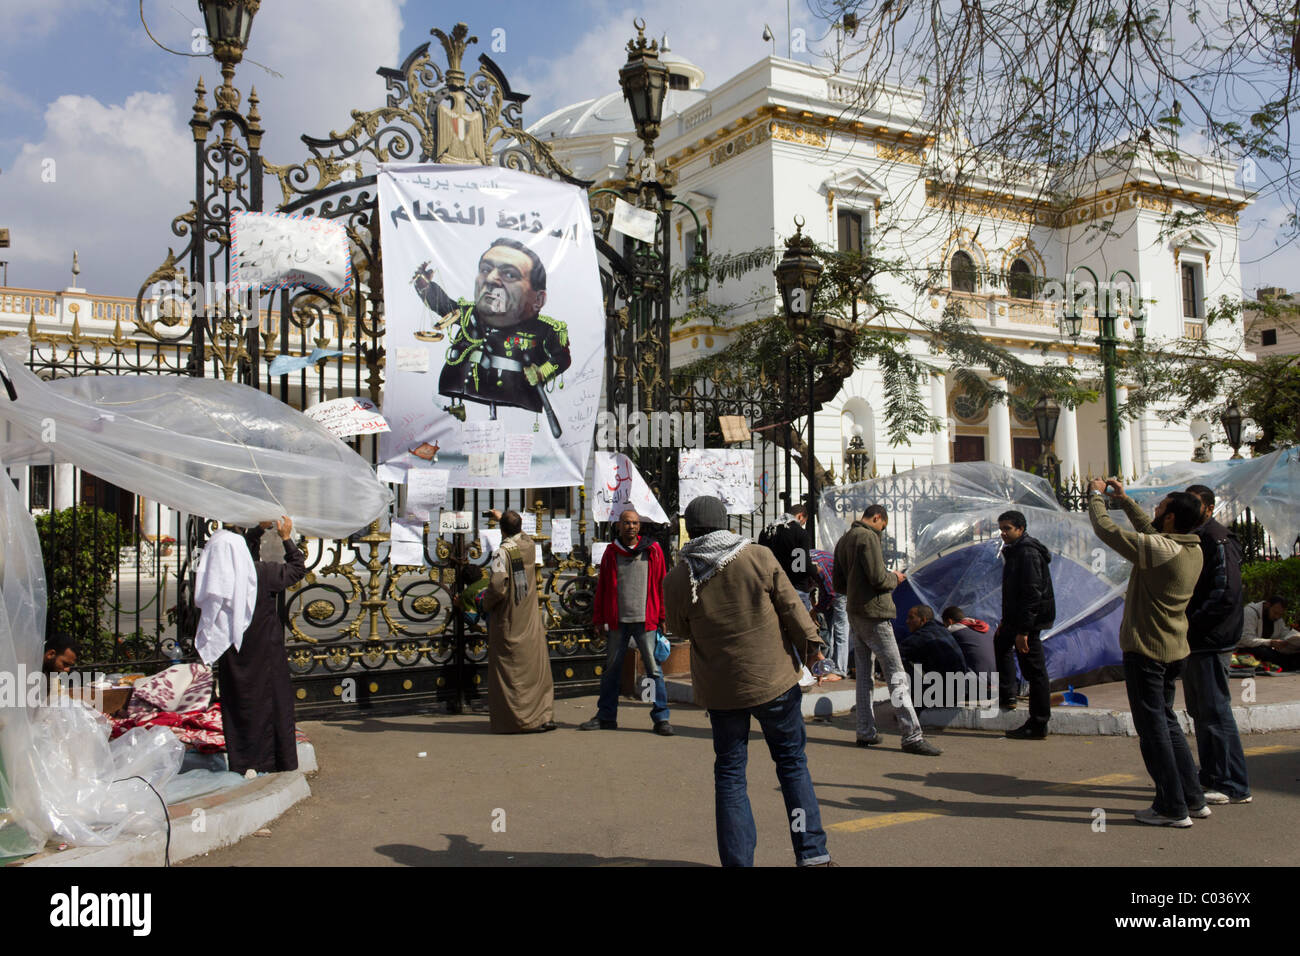 anti-Mubarak protestors at People's Assembly, Cairo, Egypt - Stock Image